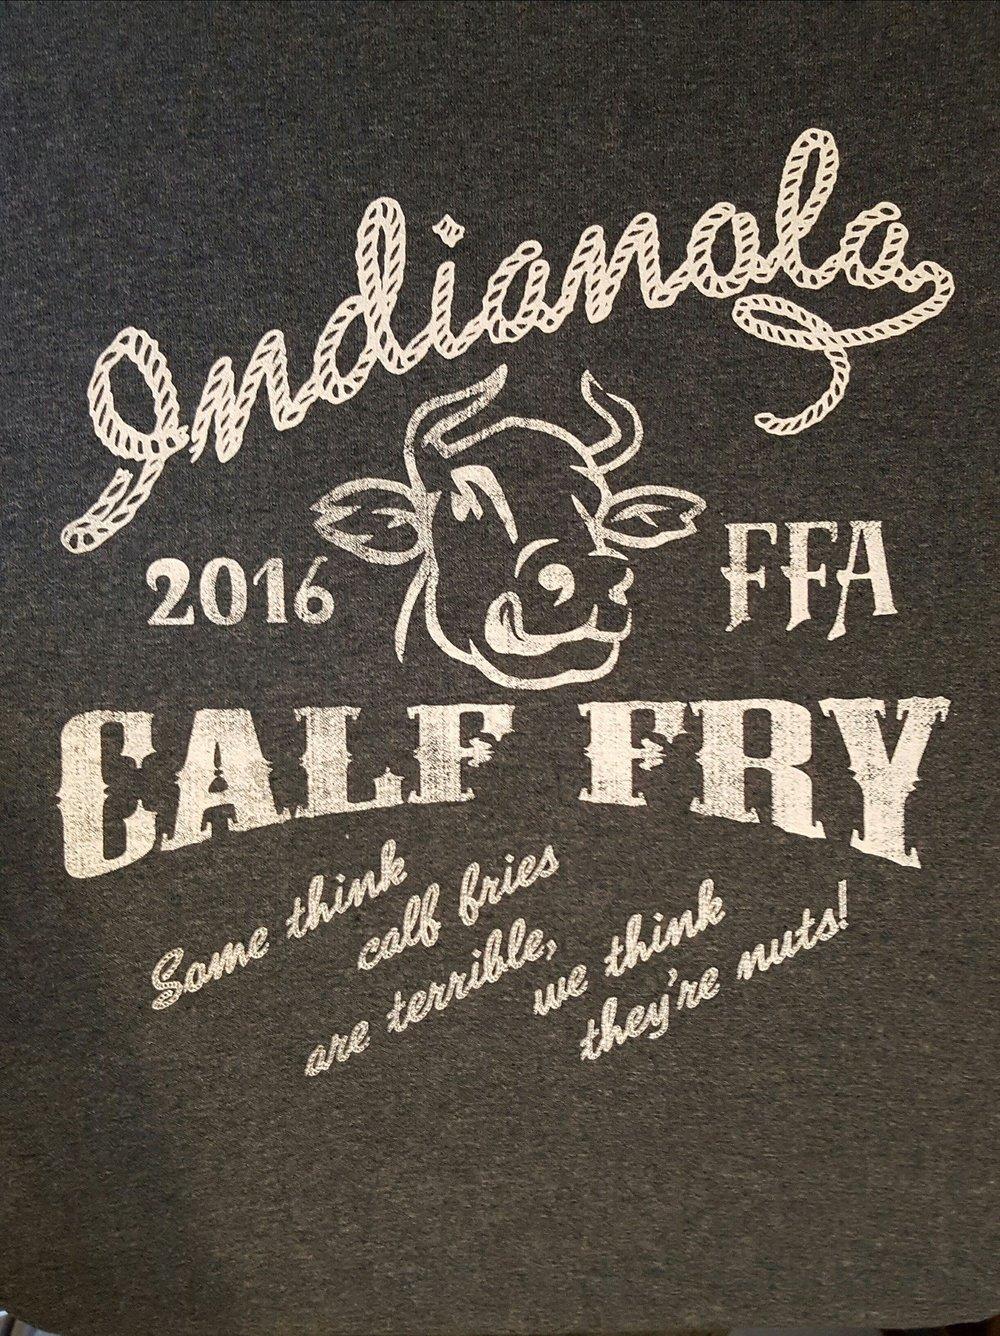 indianola calf fry.jpg